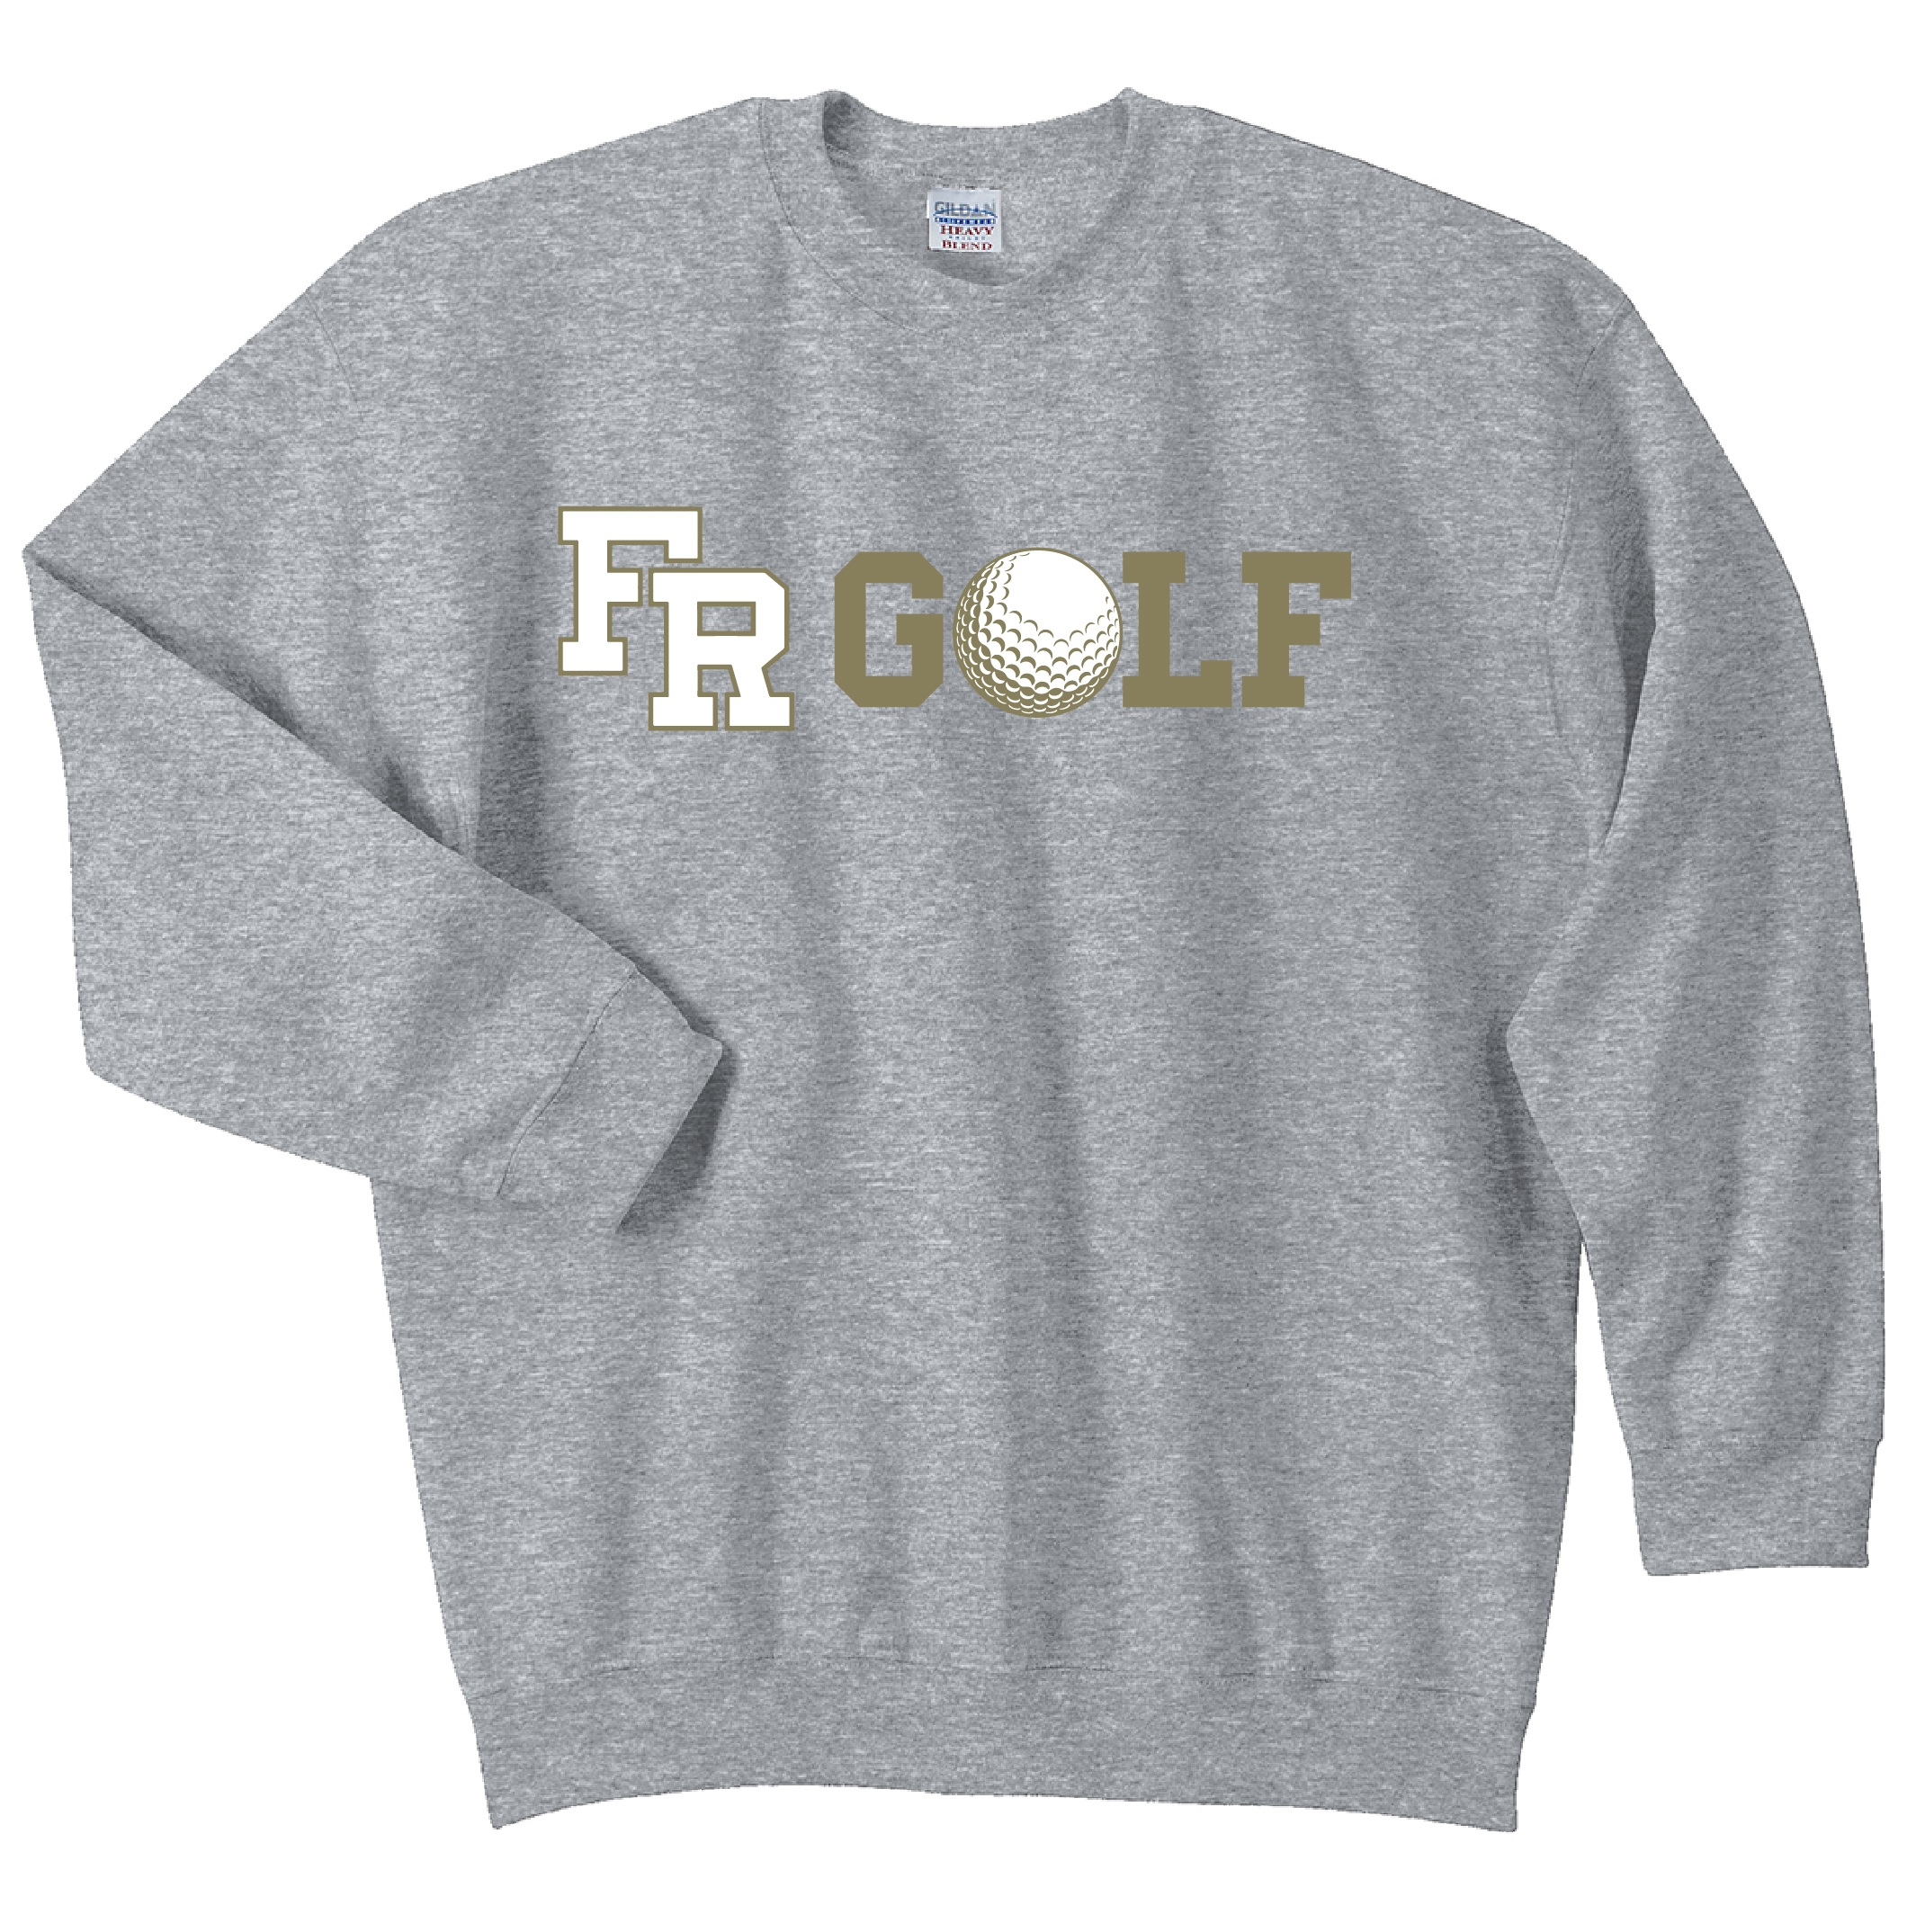 Gildan Heavy Blend Crewneck Sweatshirt  (Available in Navy or Grey)